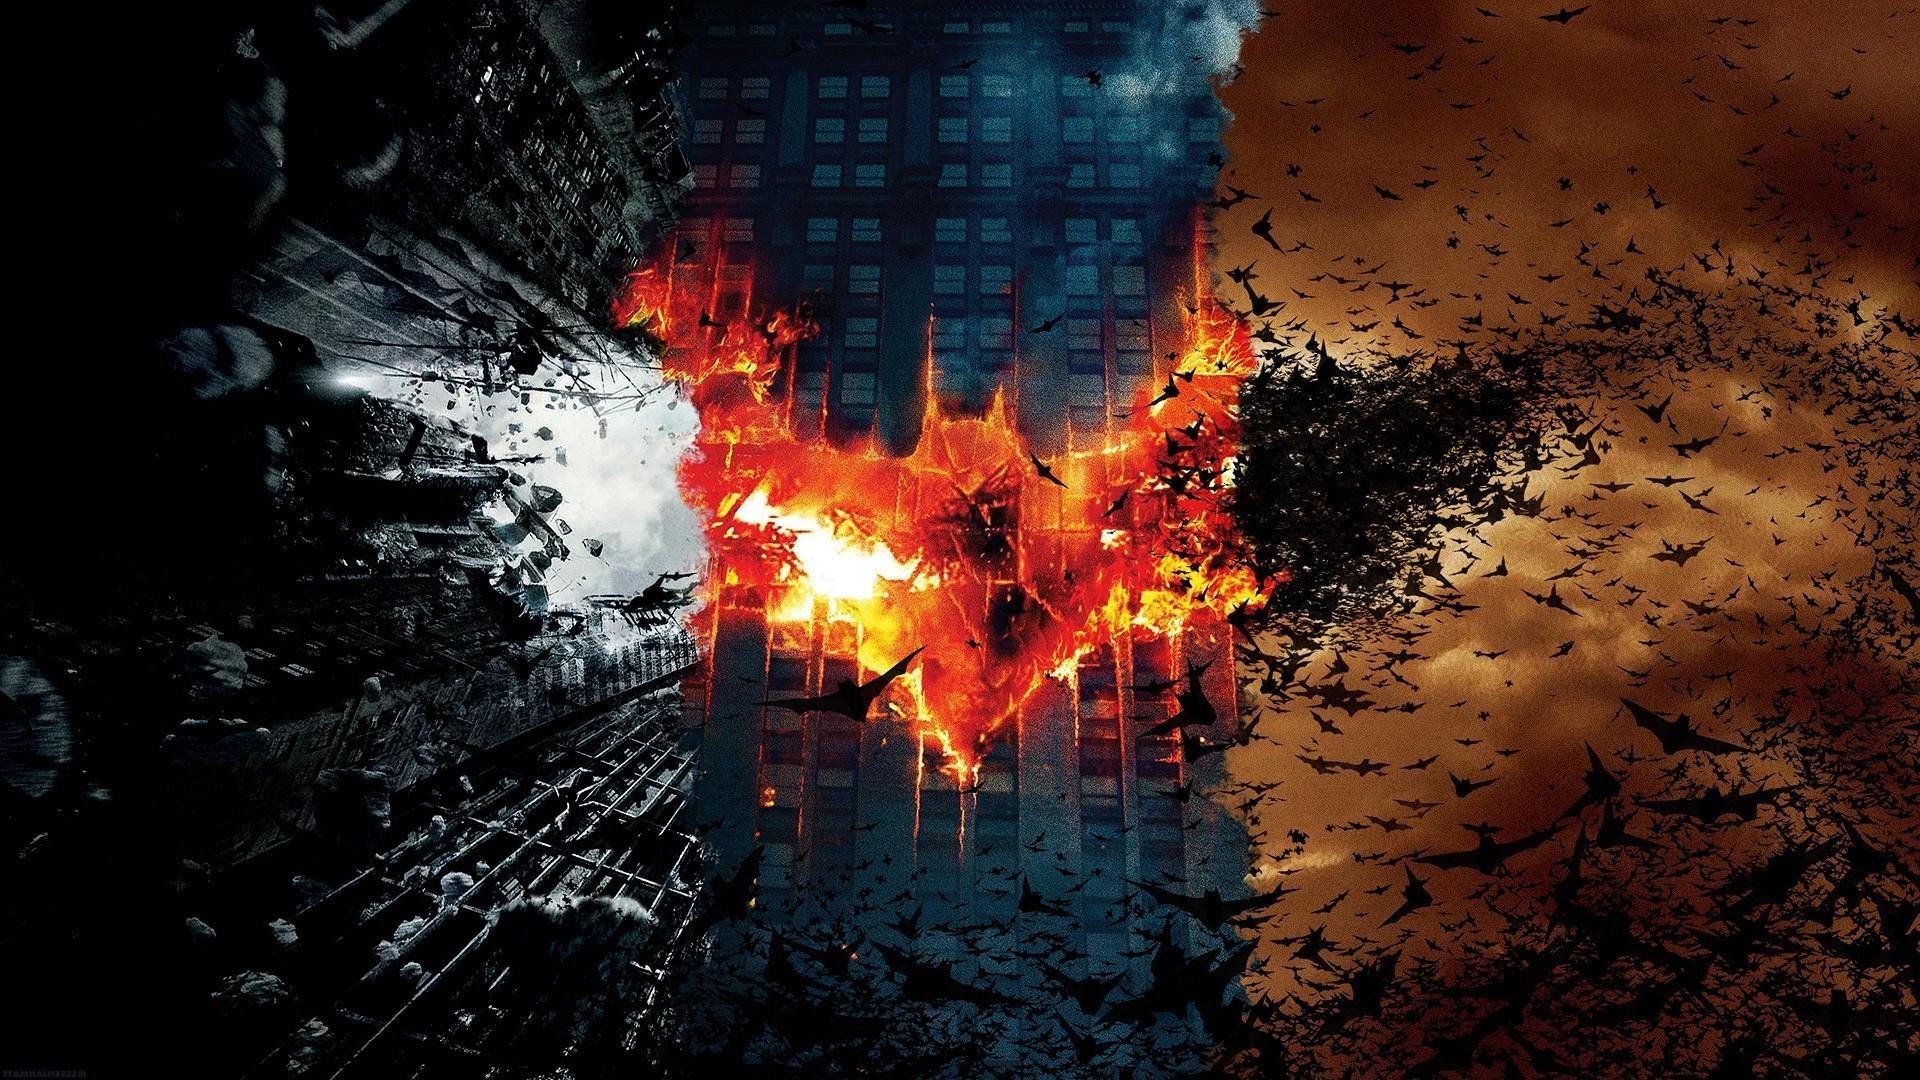 Batman, Batman Begins, The Dark Knight, The Dark Knight Rises, Movies  Wallpapers HD / Desktop and Mobile Backgrounds